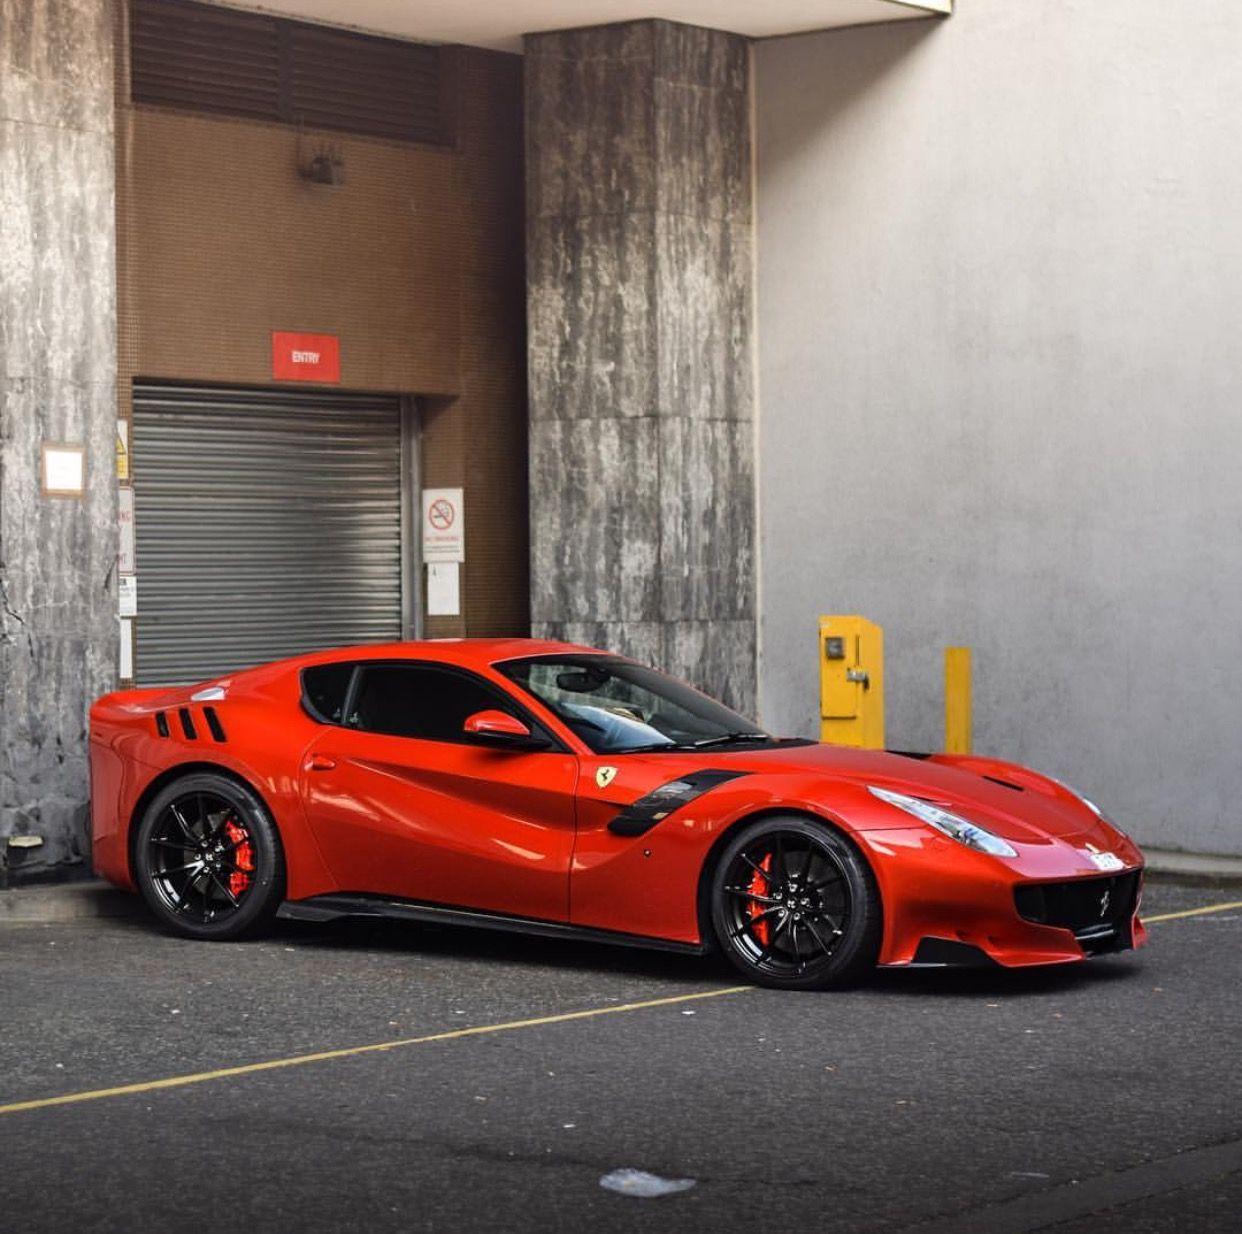 Ferrari F12 TDF Painted In Rosso Maranello Photo Taken By